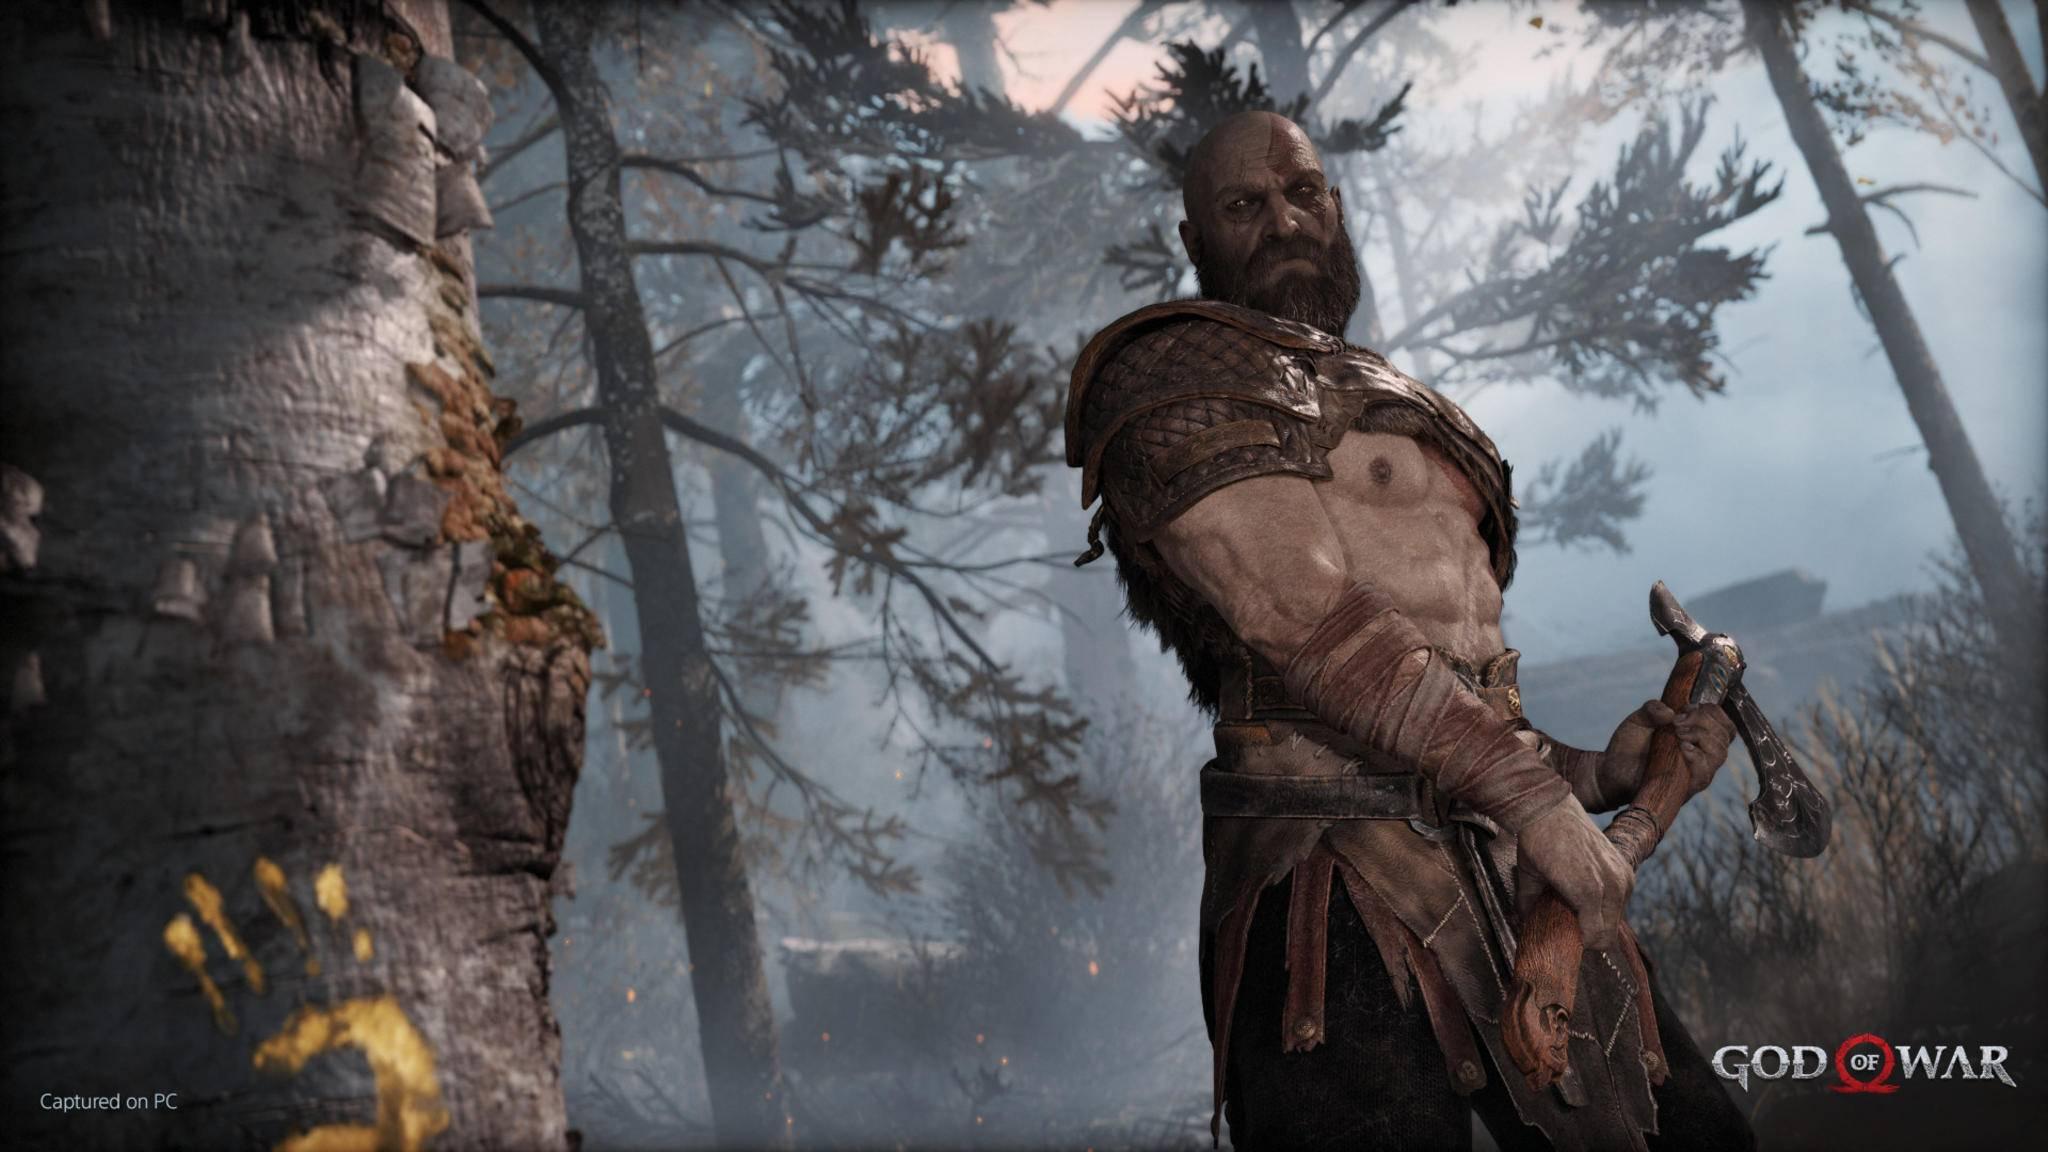 god-of-war-pc-titelbild